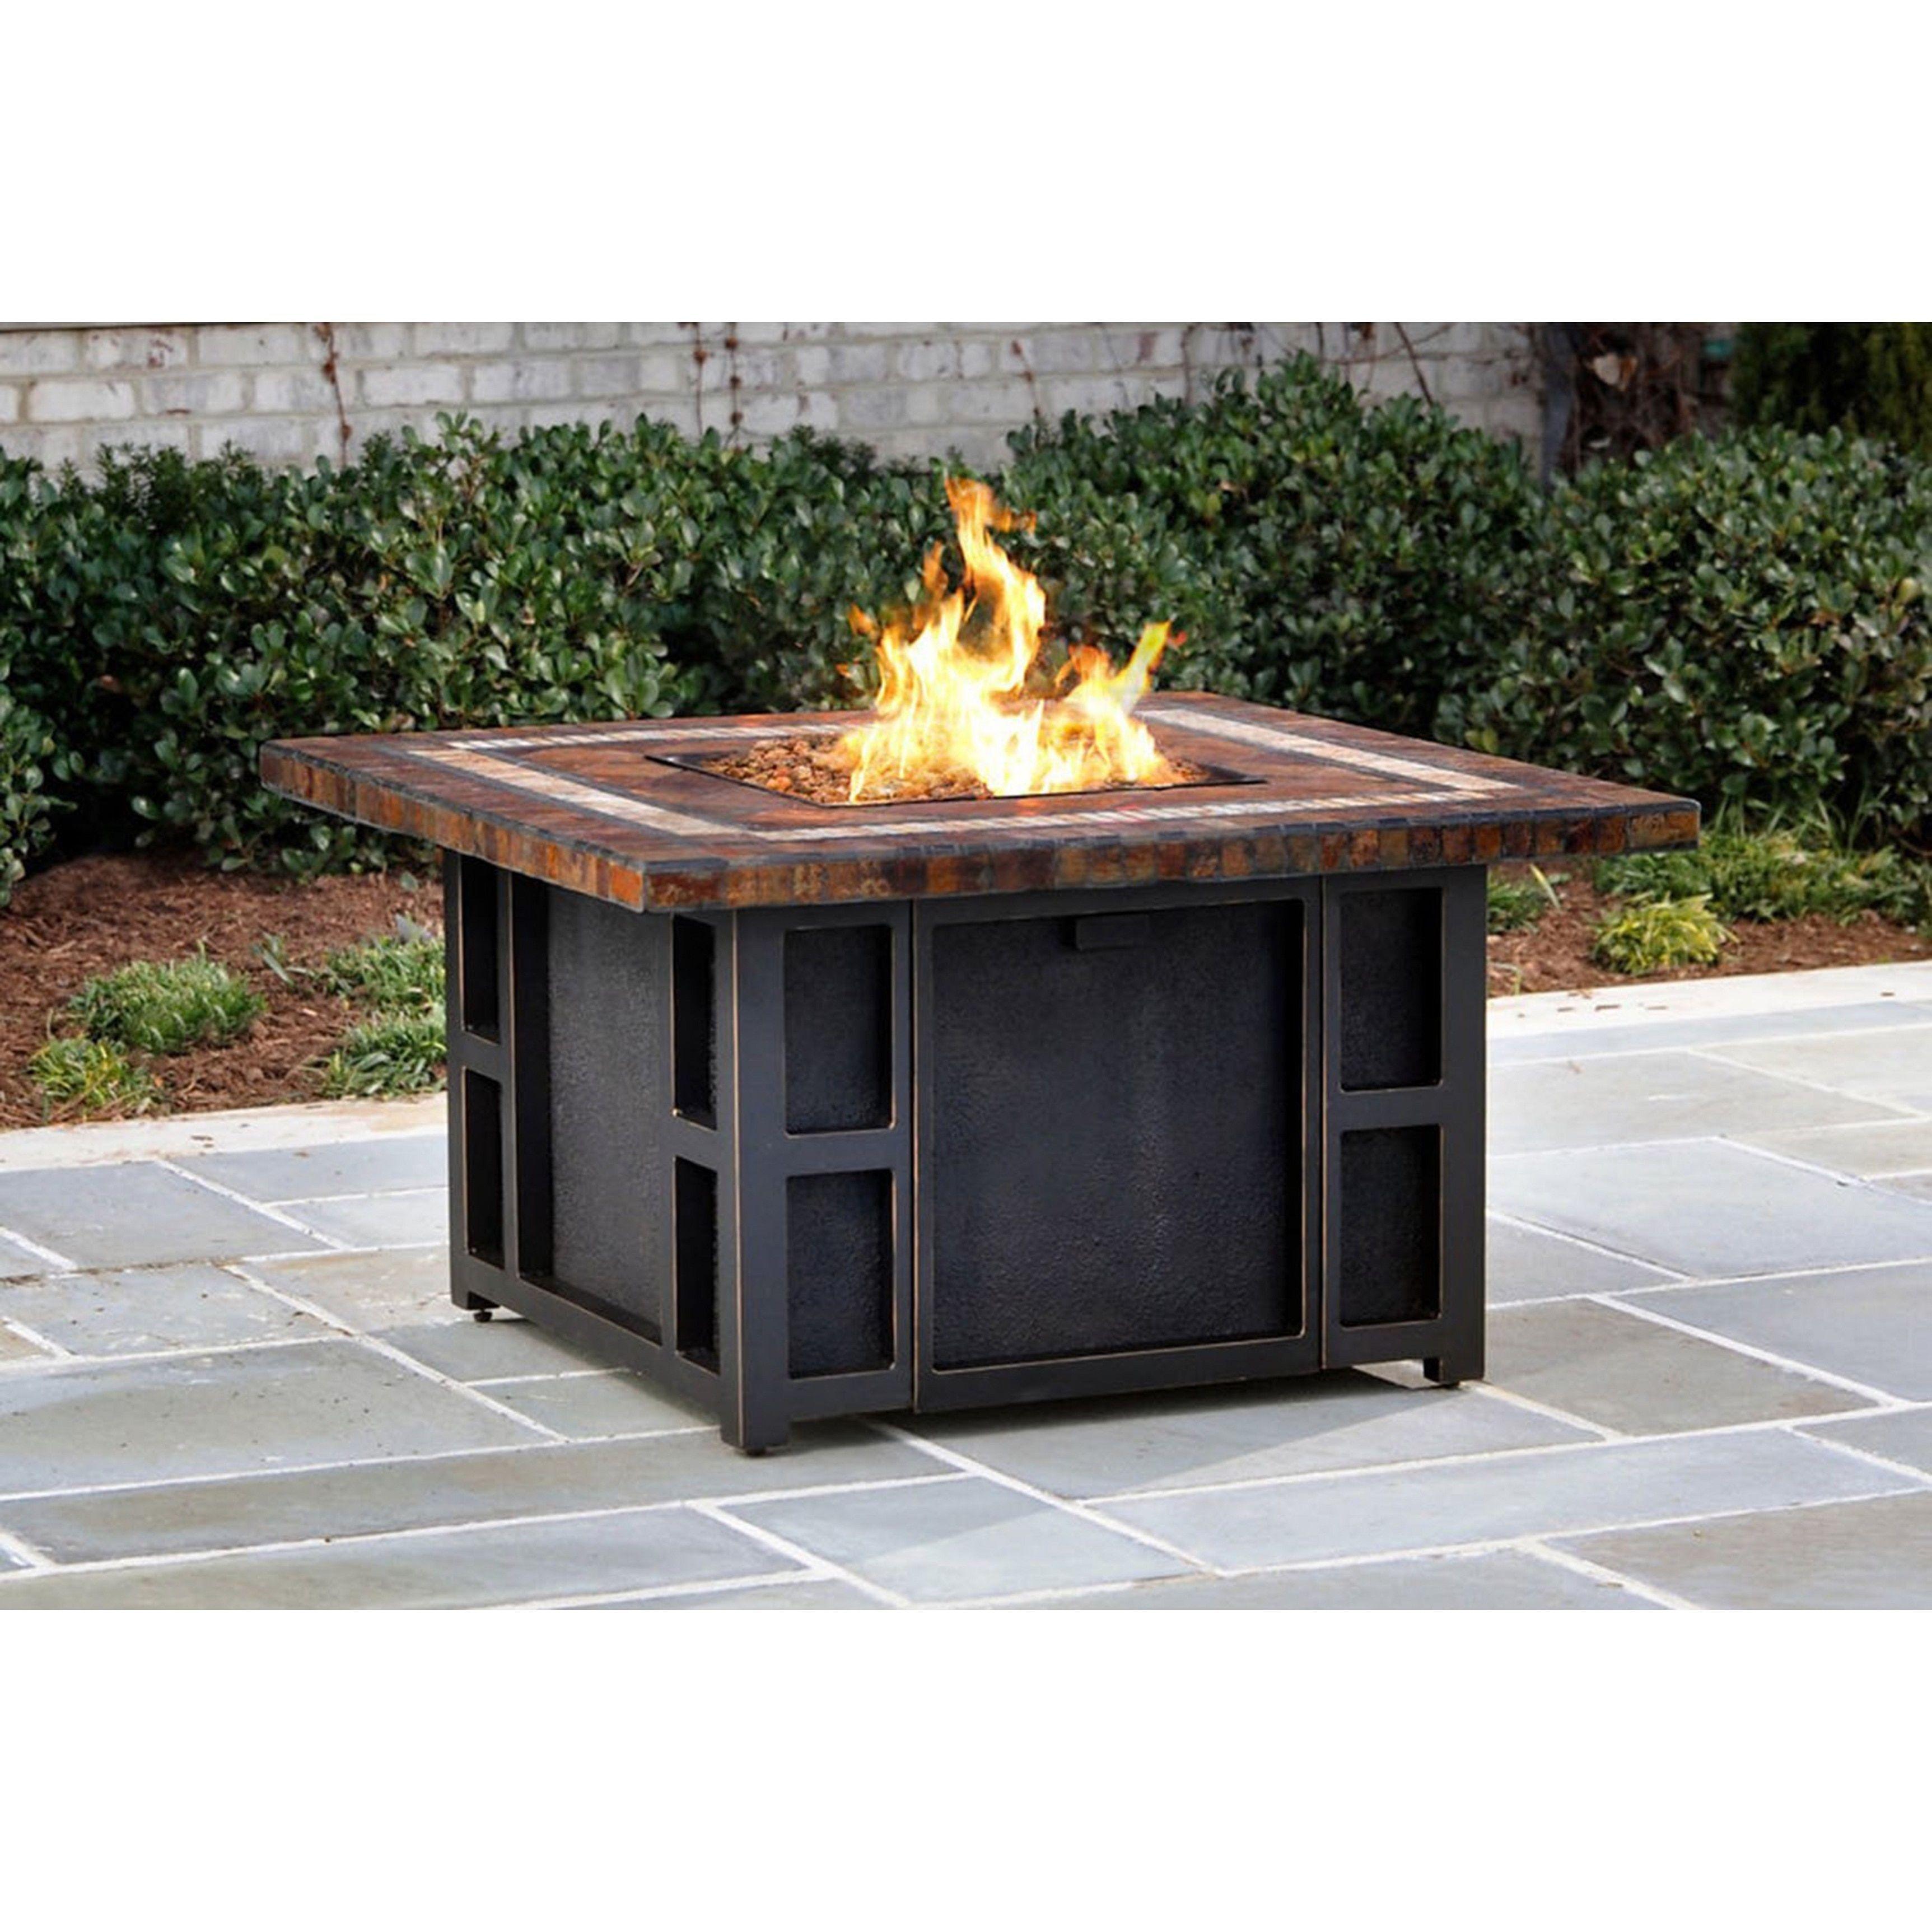 Aspen Firepit Table with Strip Burner System, Amber Lava